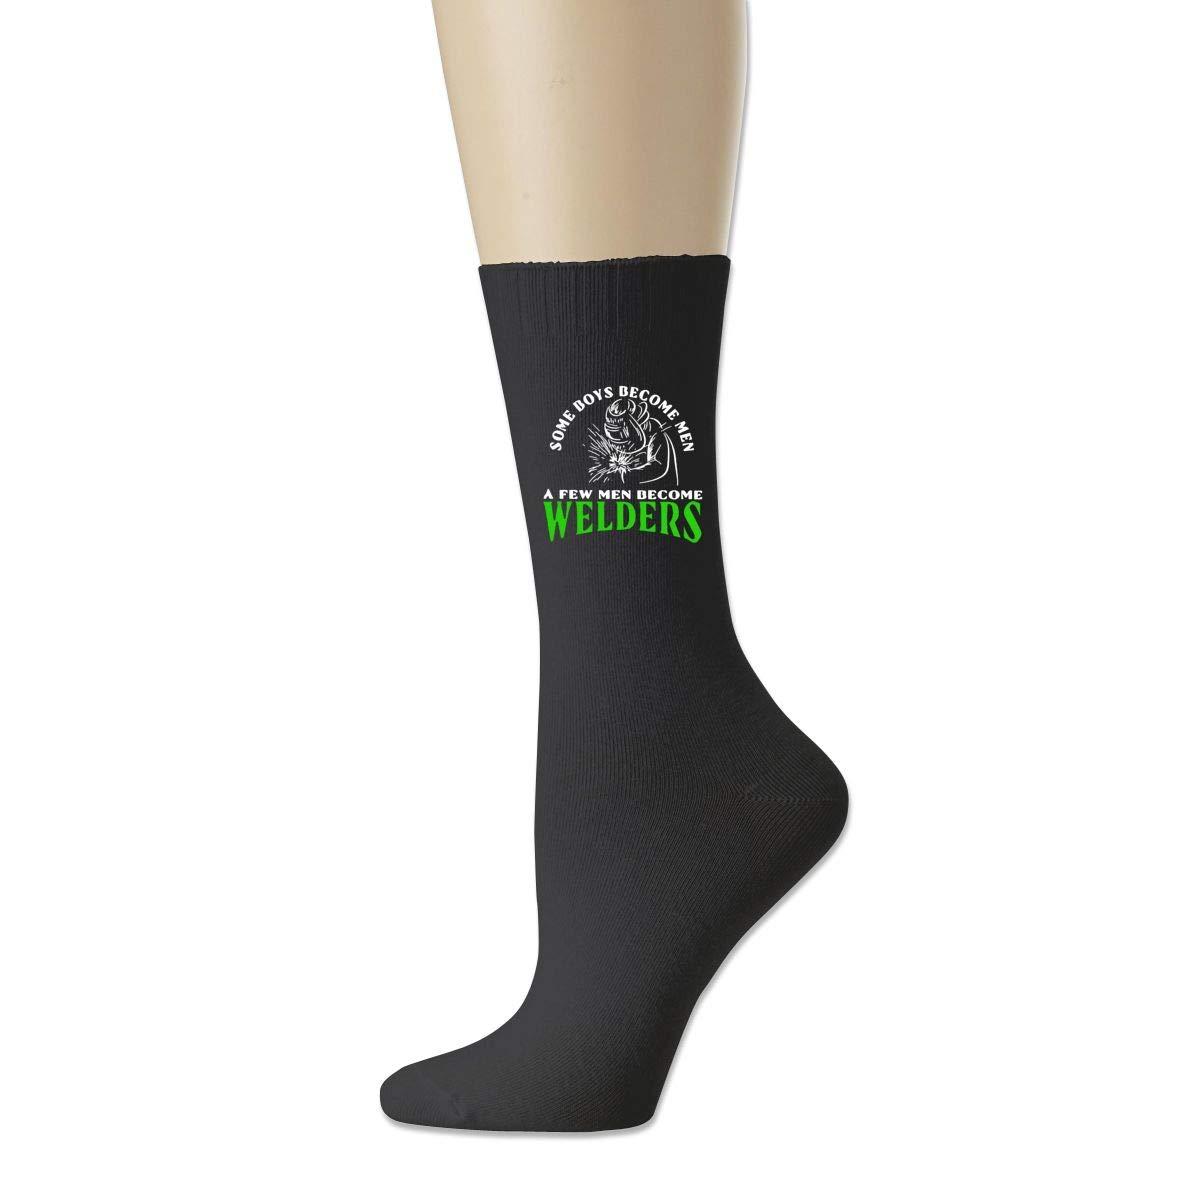 Some Boys Become Men Welder Running Cotton Crew Socks Athletic Sock Men Women Created Equal